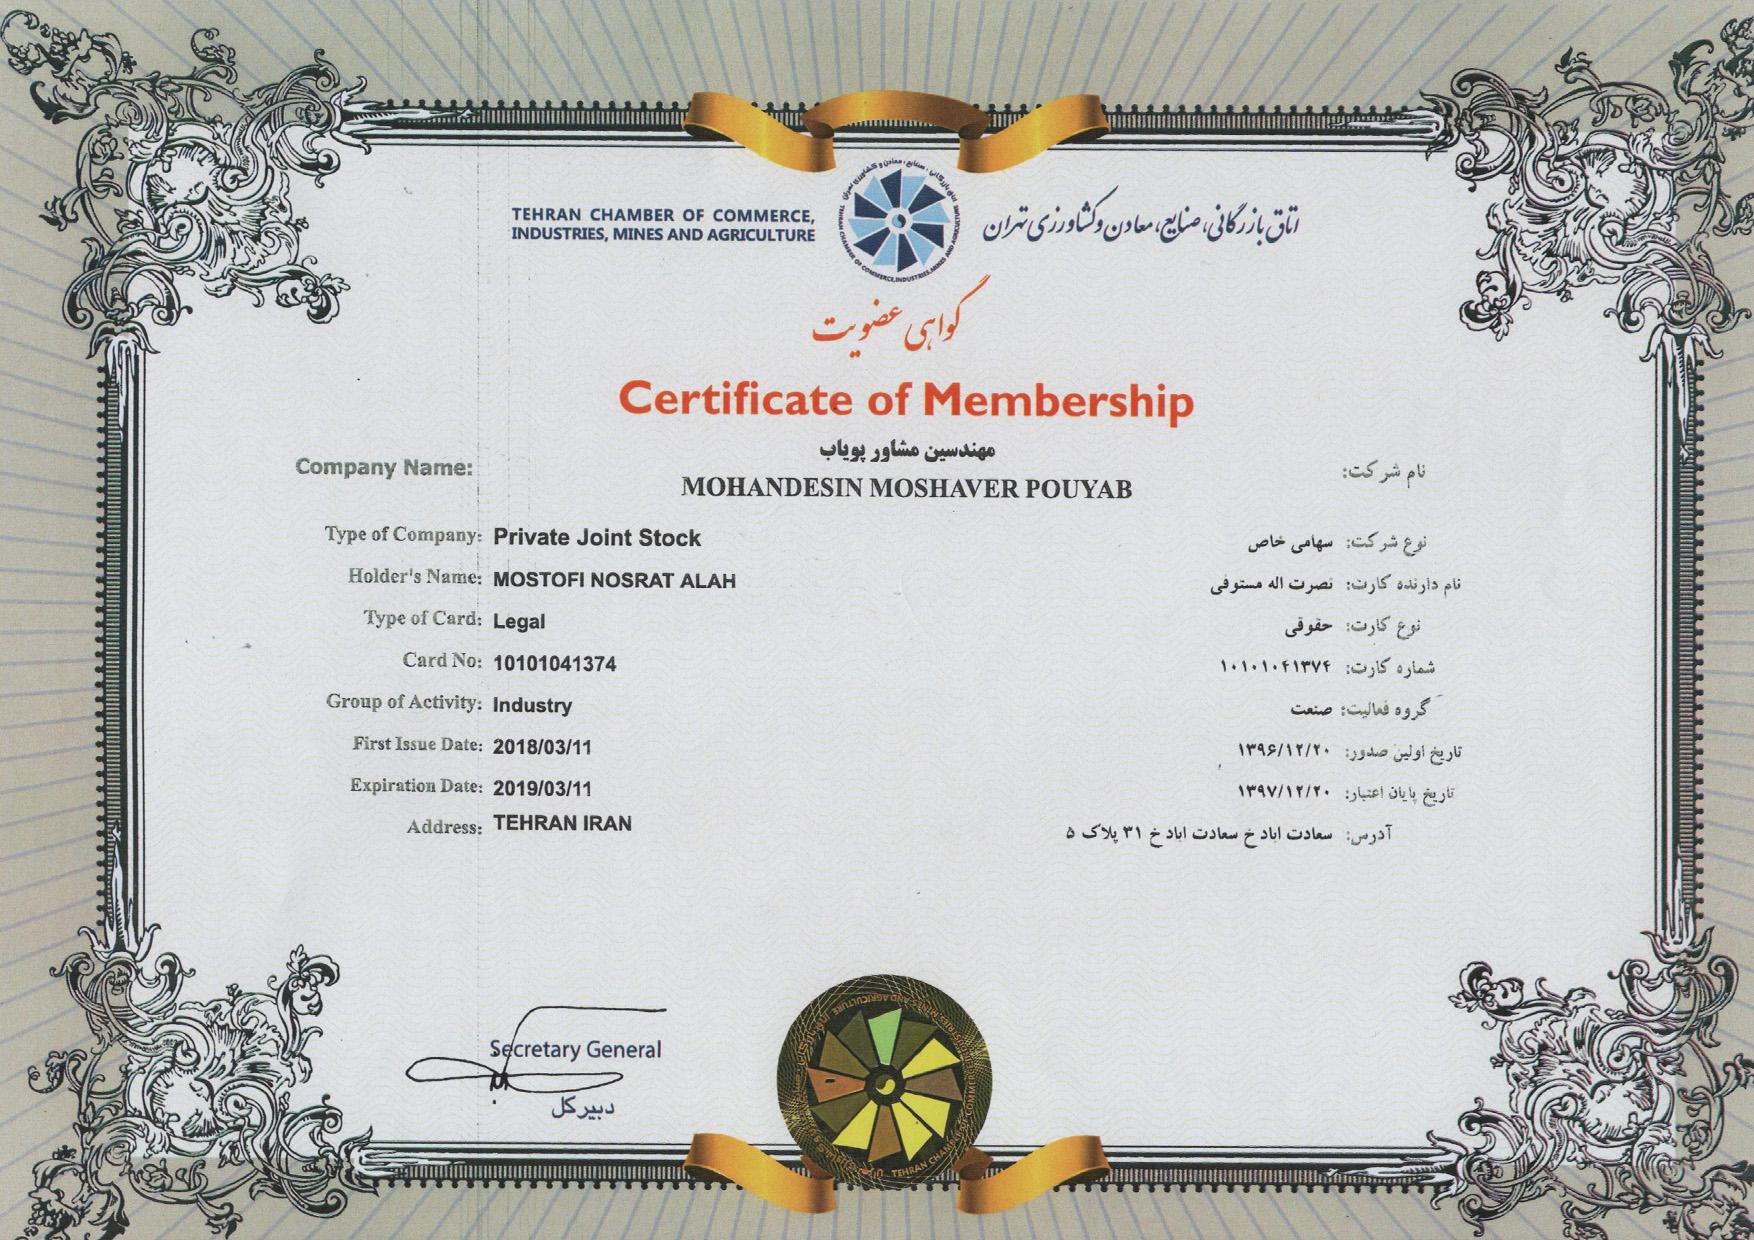 CRTF-TehranChamberOfCommerce-Pooyab